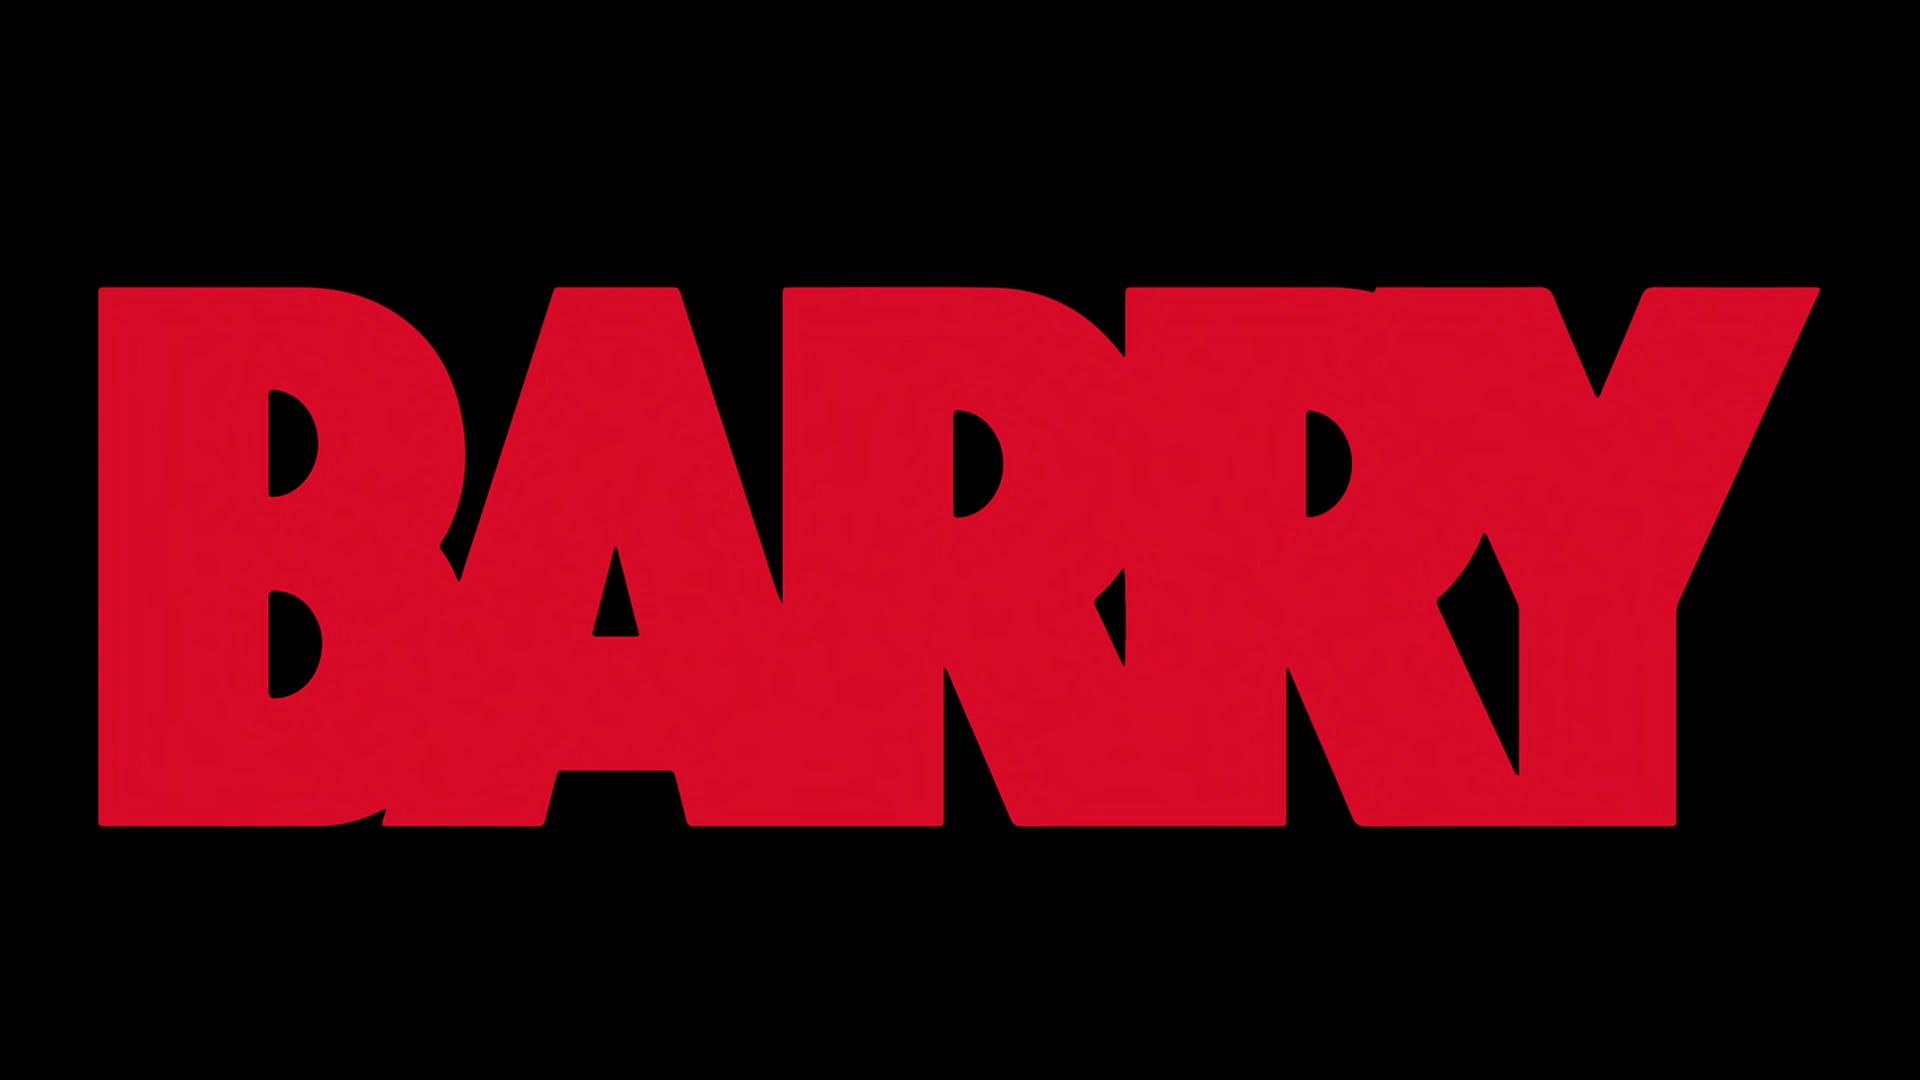 Барри (2 сезон 1-8 серии из 8) (2019)   WEB-DL 1080p   Amedia